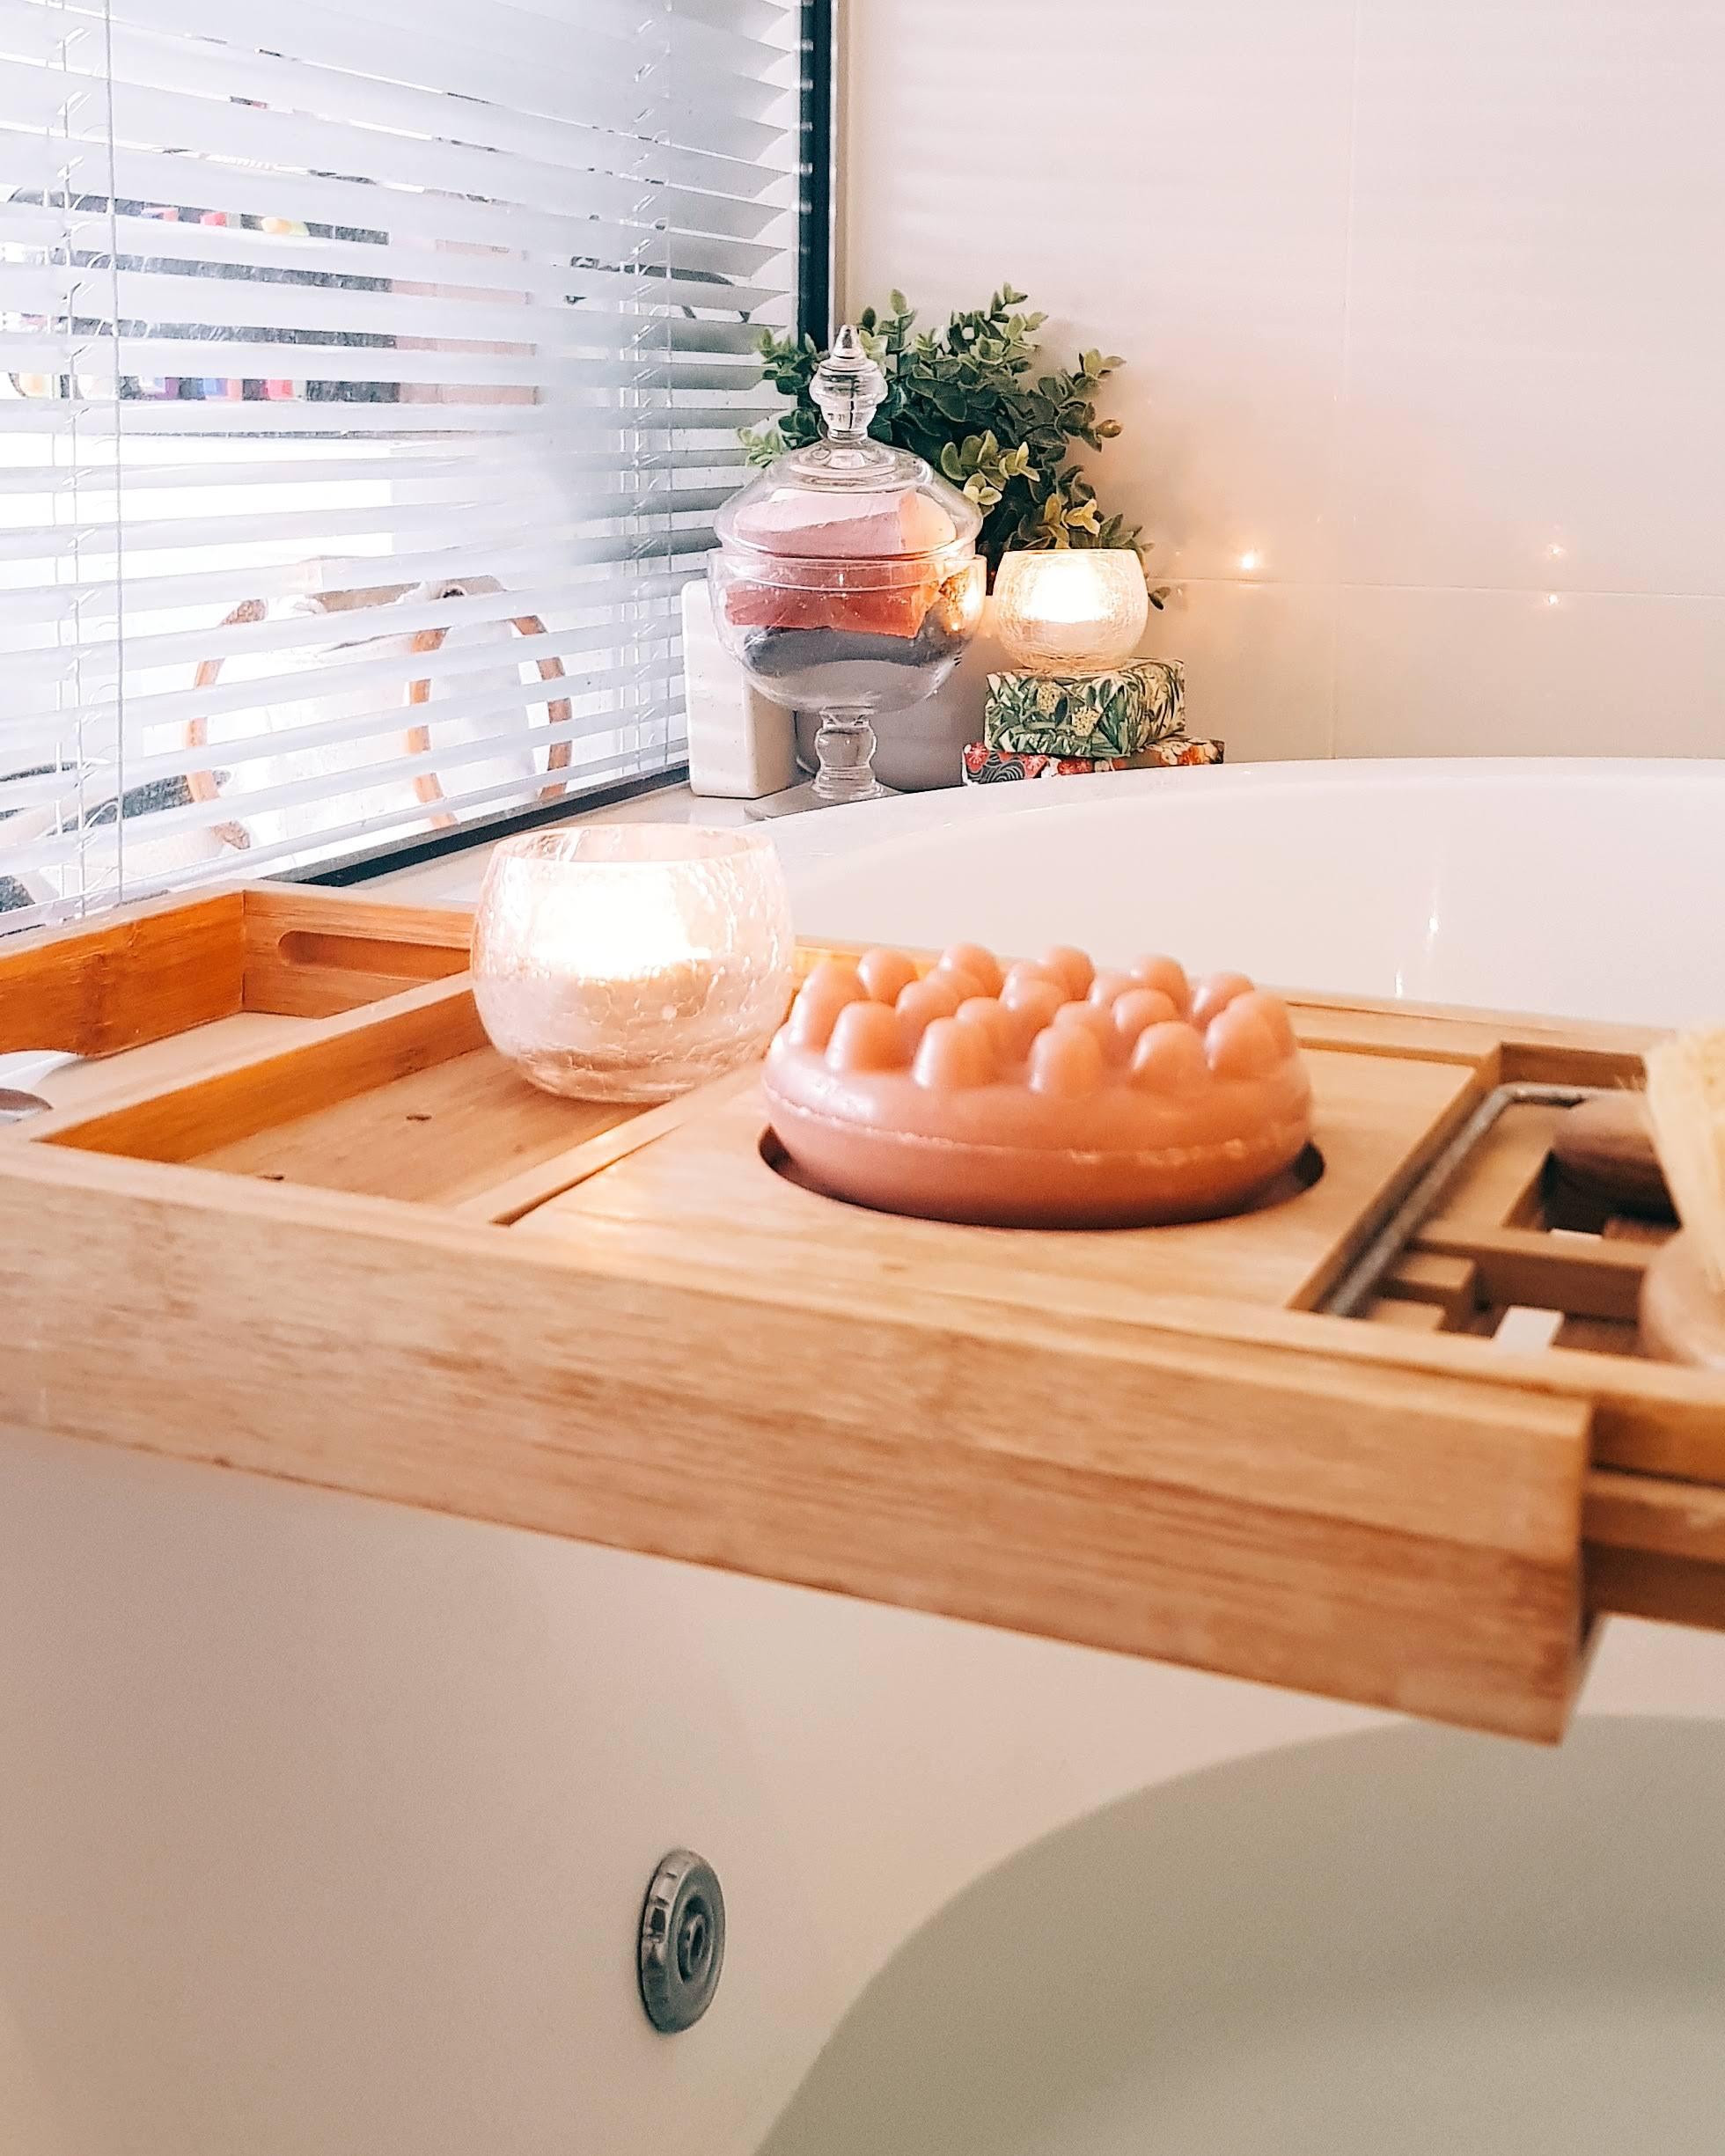 self care bath body botanical vegan products beauty lifestyle blog